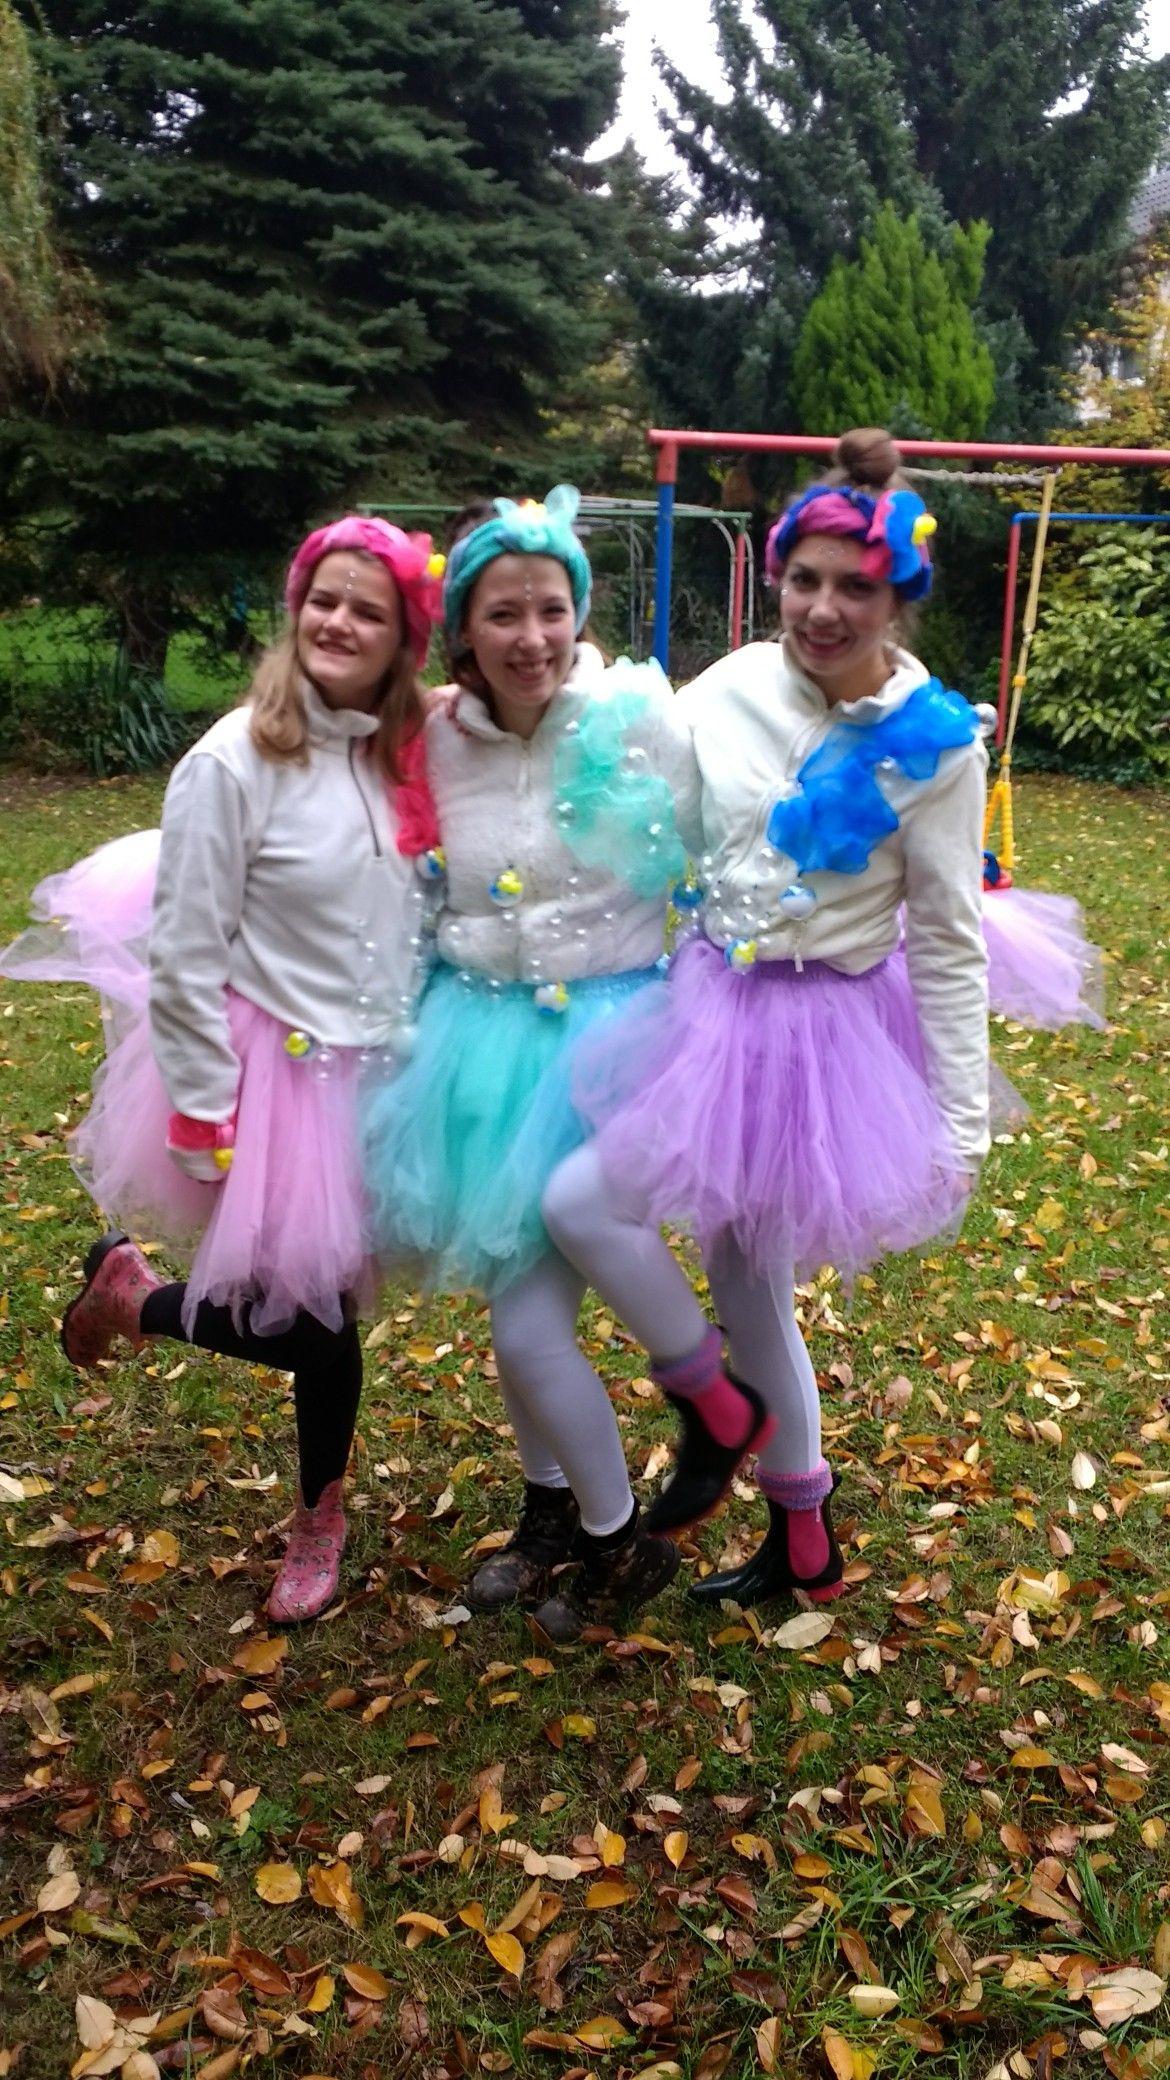 Badewanne Kostüm kostüm schaumbad badewanne karneval karneval